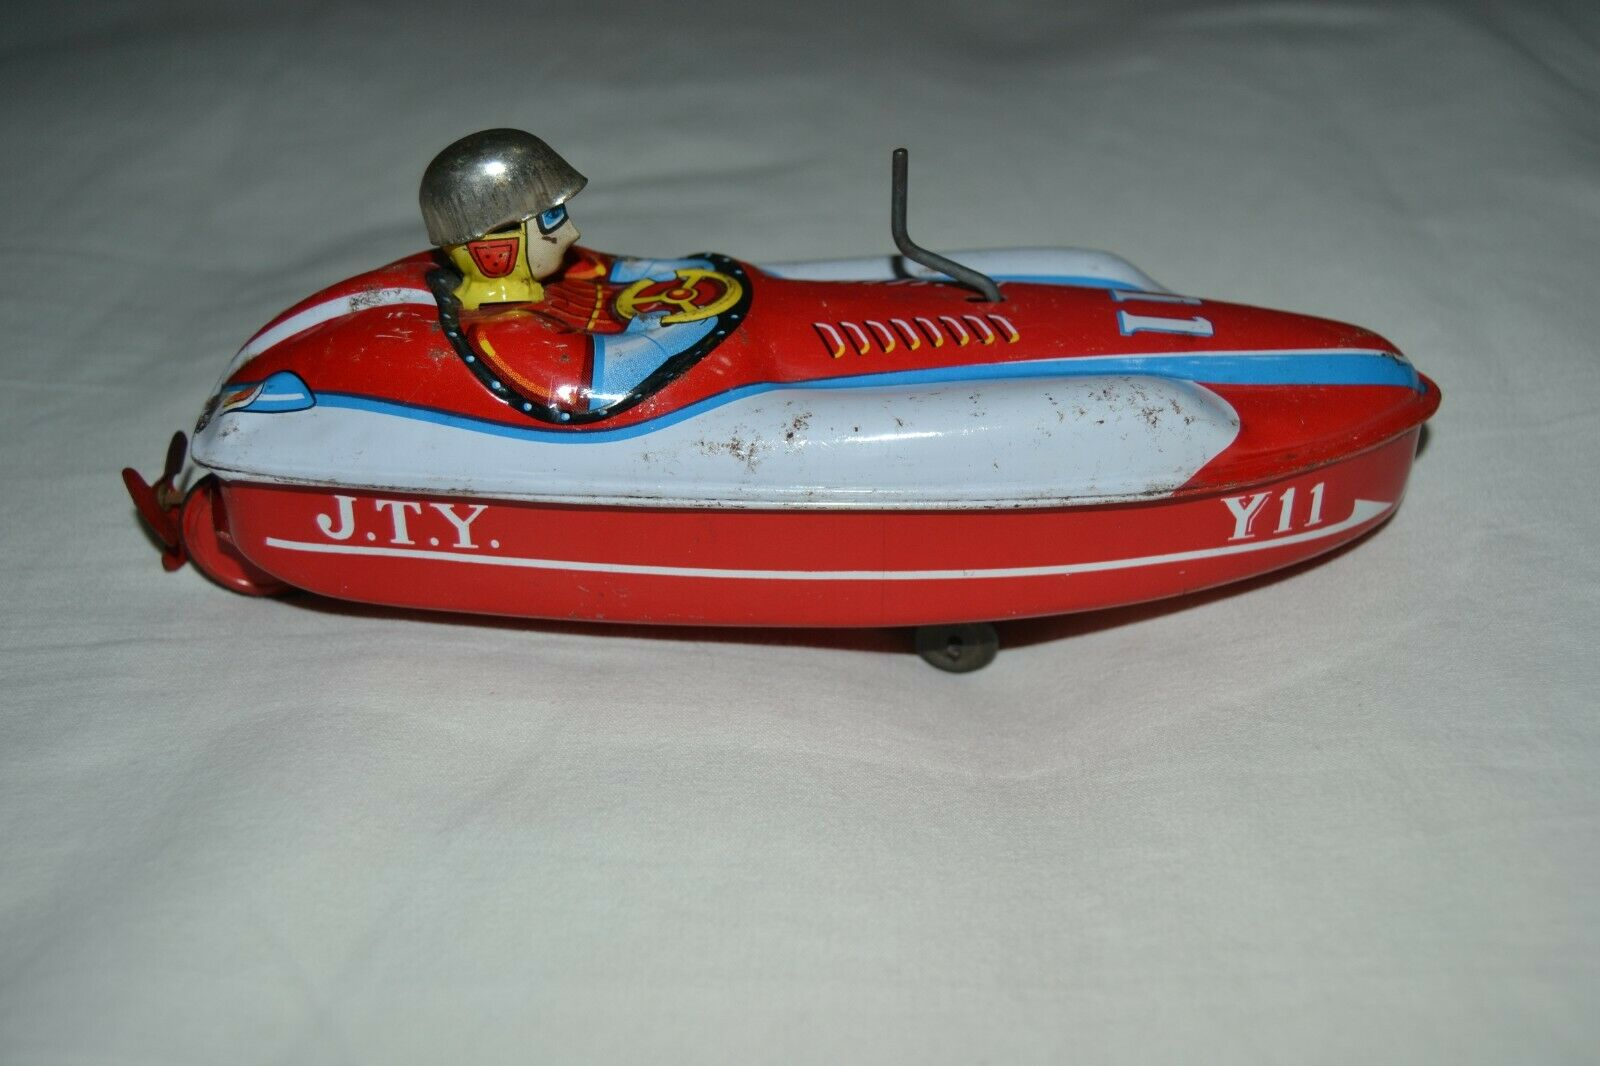 Tin toy Yonezawa,  Barca a carica carica manuale anni 60-60s manual winding boat